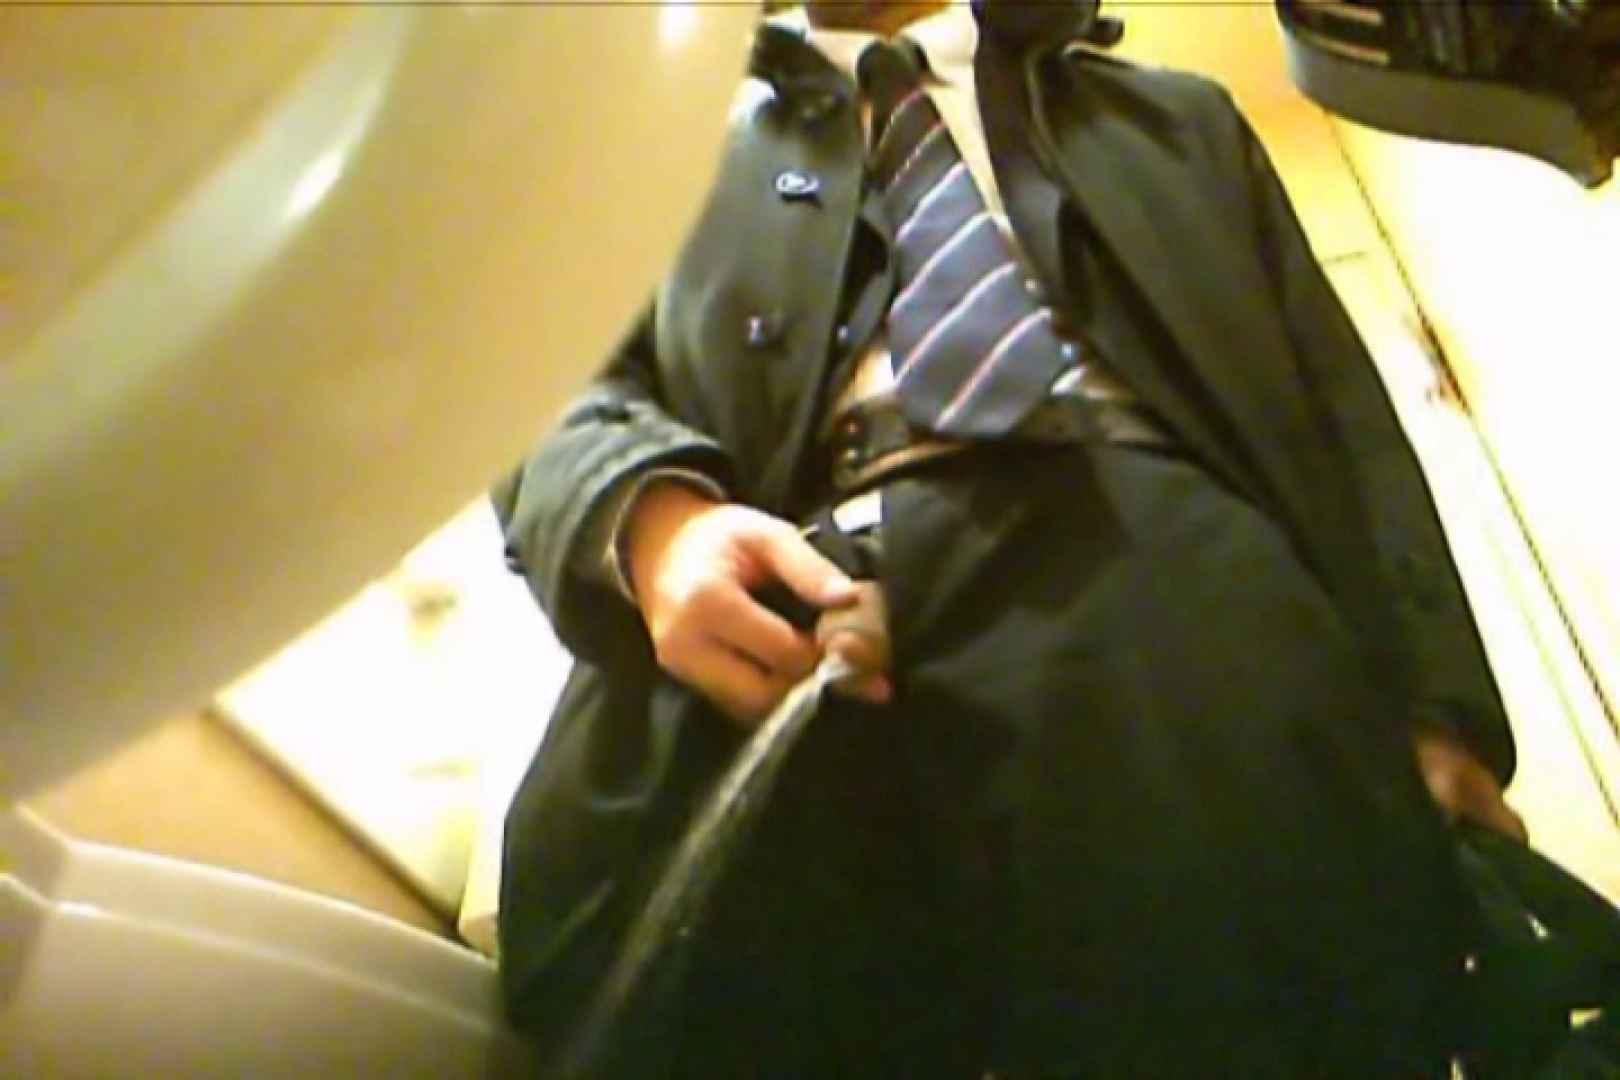 SEASON 2ND!掴み取りさんの洗面所覗き!in新幹線!VOL.06 覗きシーン ゲイ射精画像 87枚 37